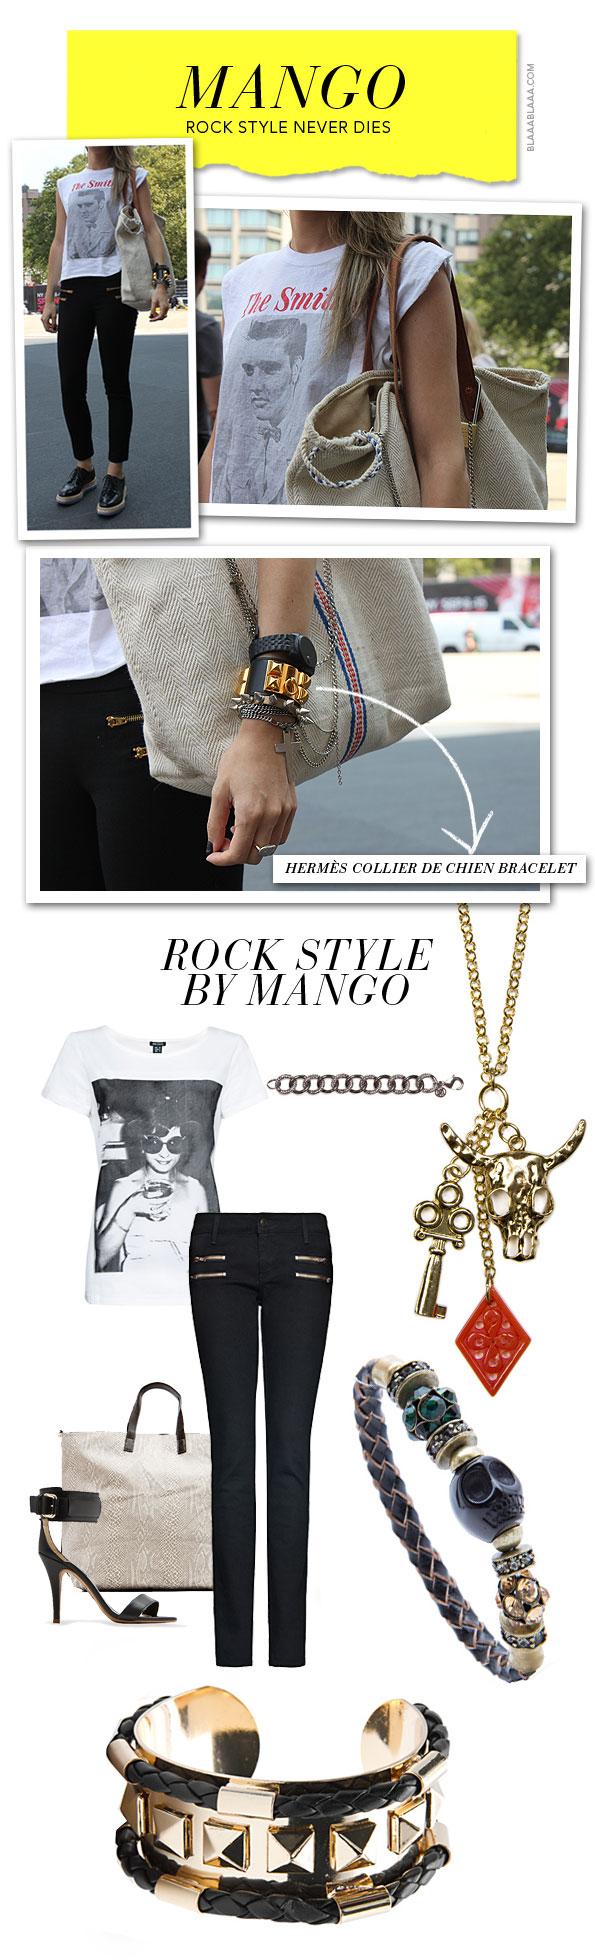 Rock Style Never Dies Stil Rockige Mode Und Rock Style